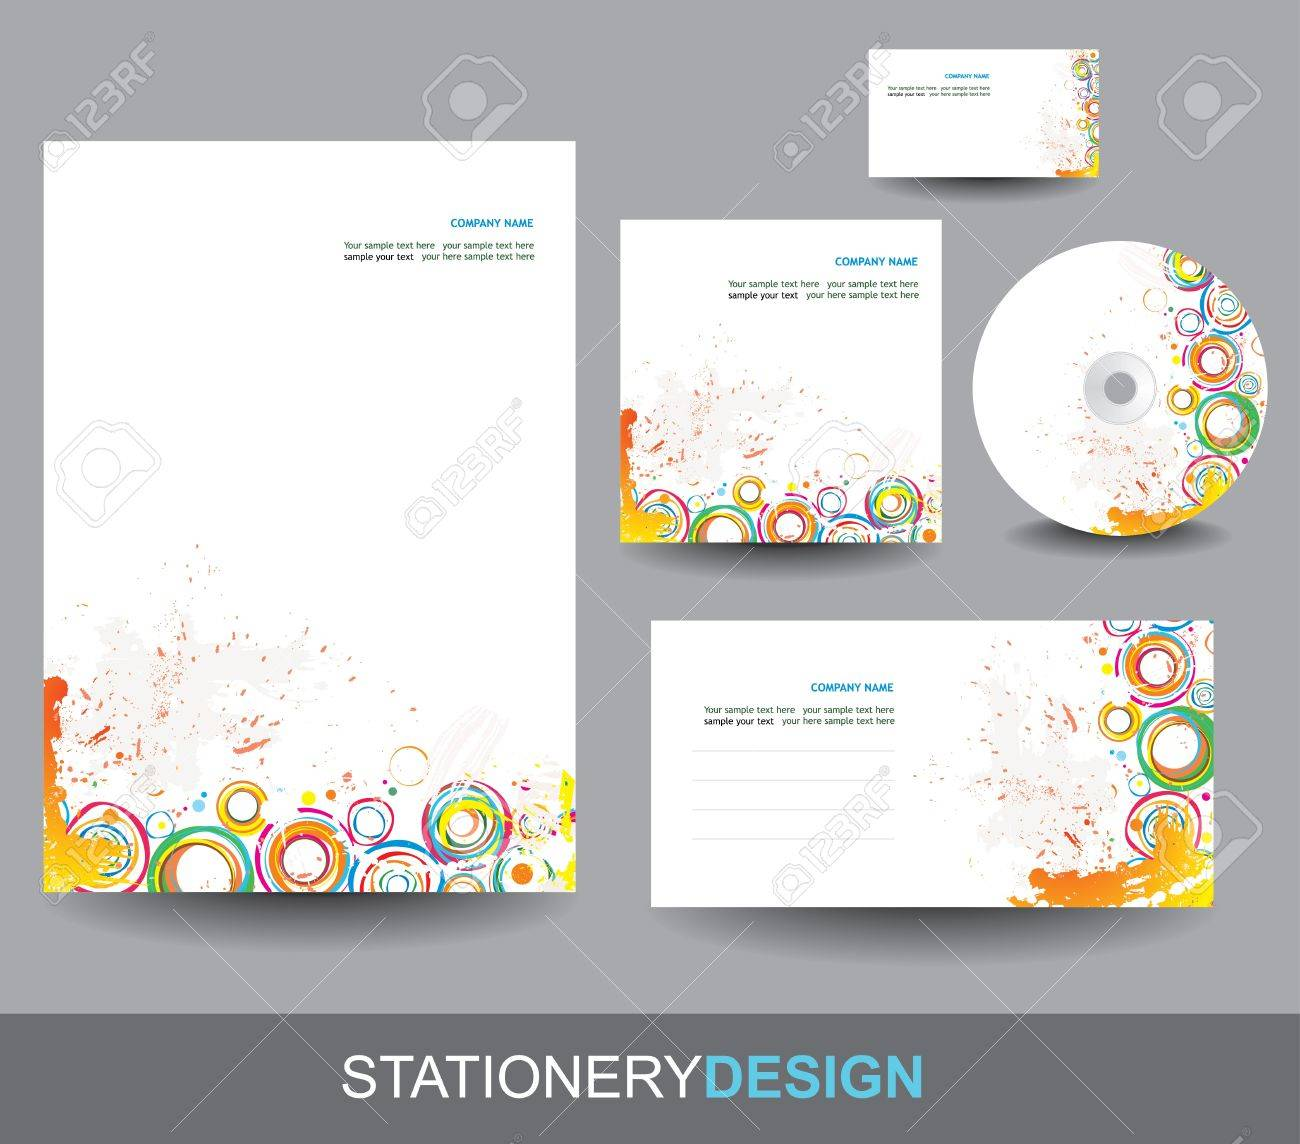 Stationery design set - 15556459